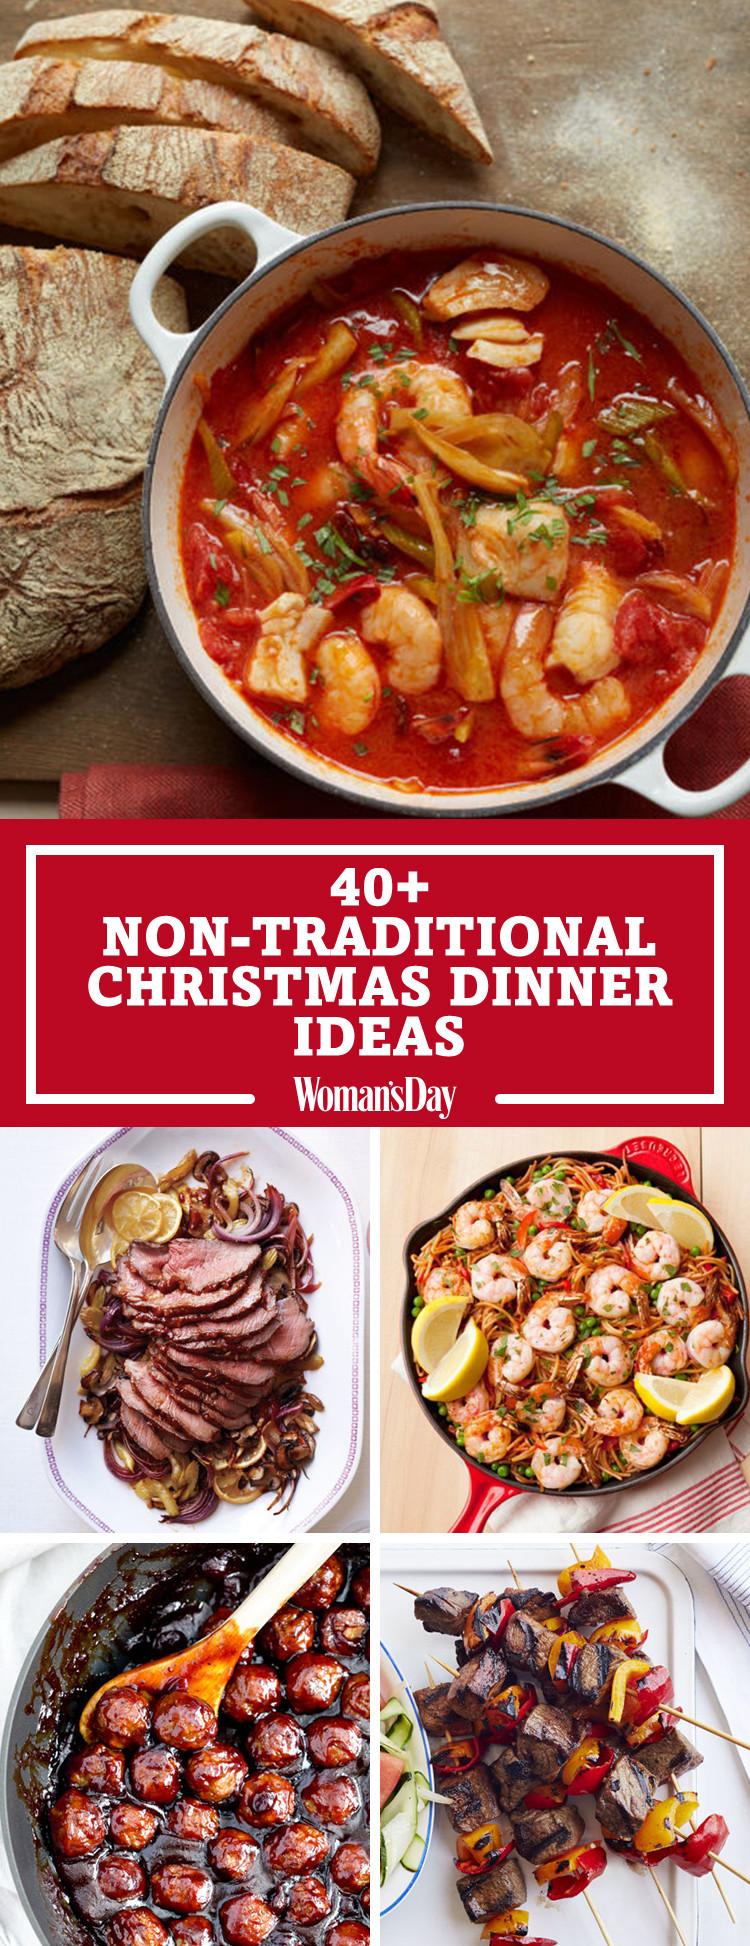 Non Traditional Christmas Dinner  40 Easy Christmas Dinner Ideas Best Recipes for